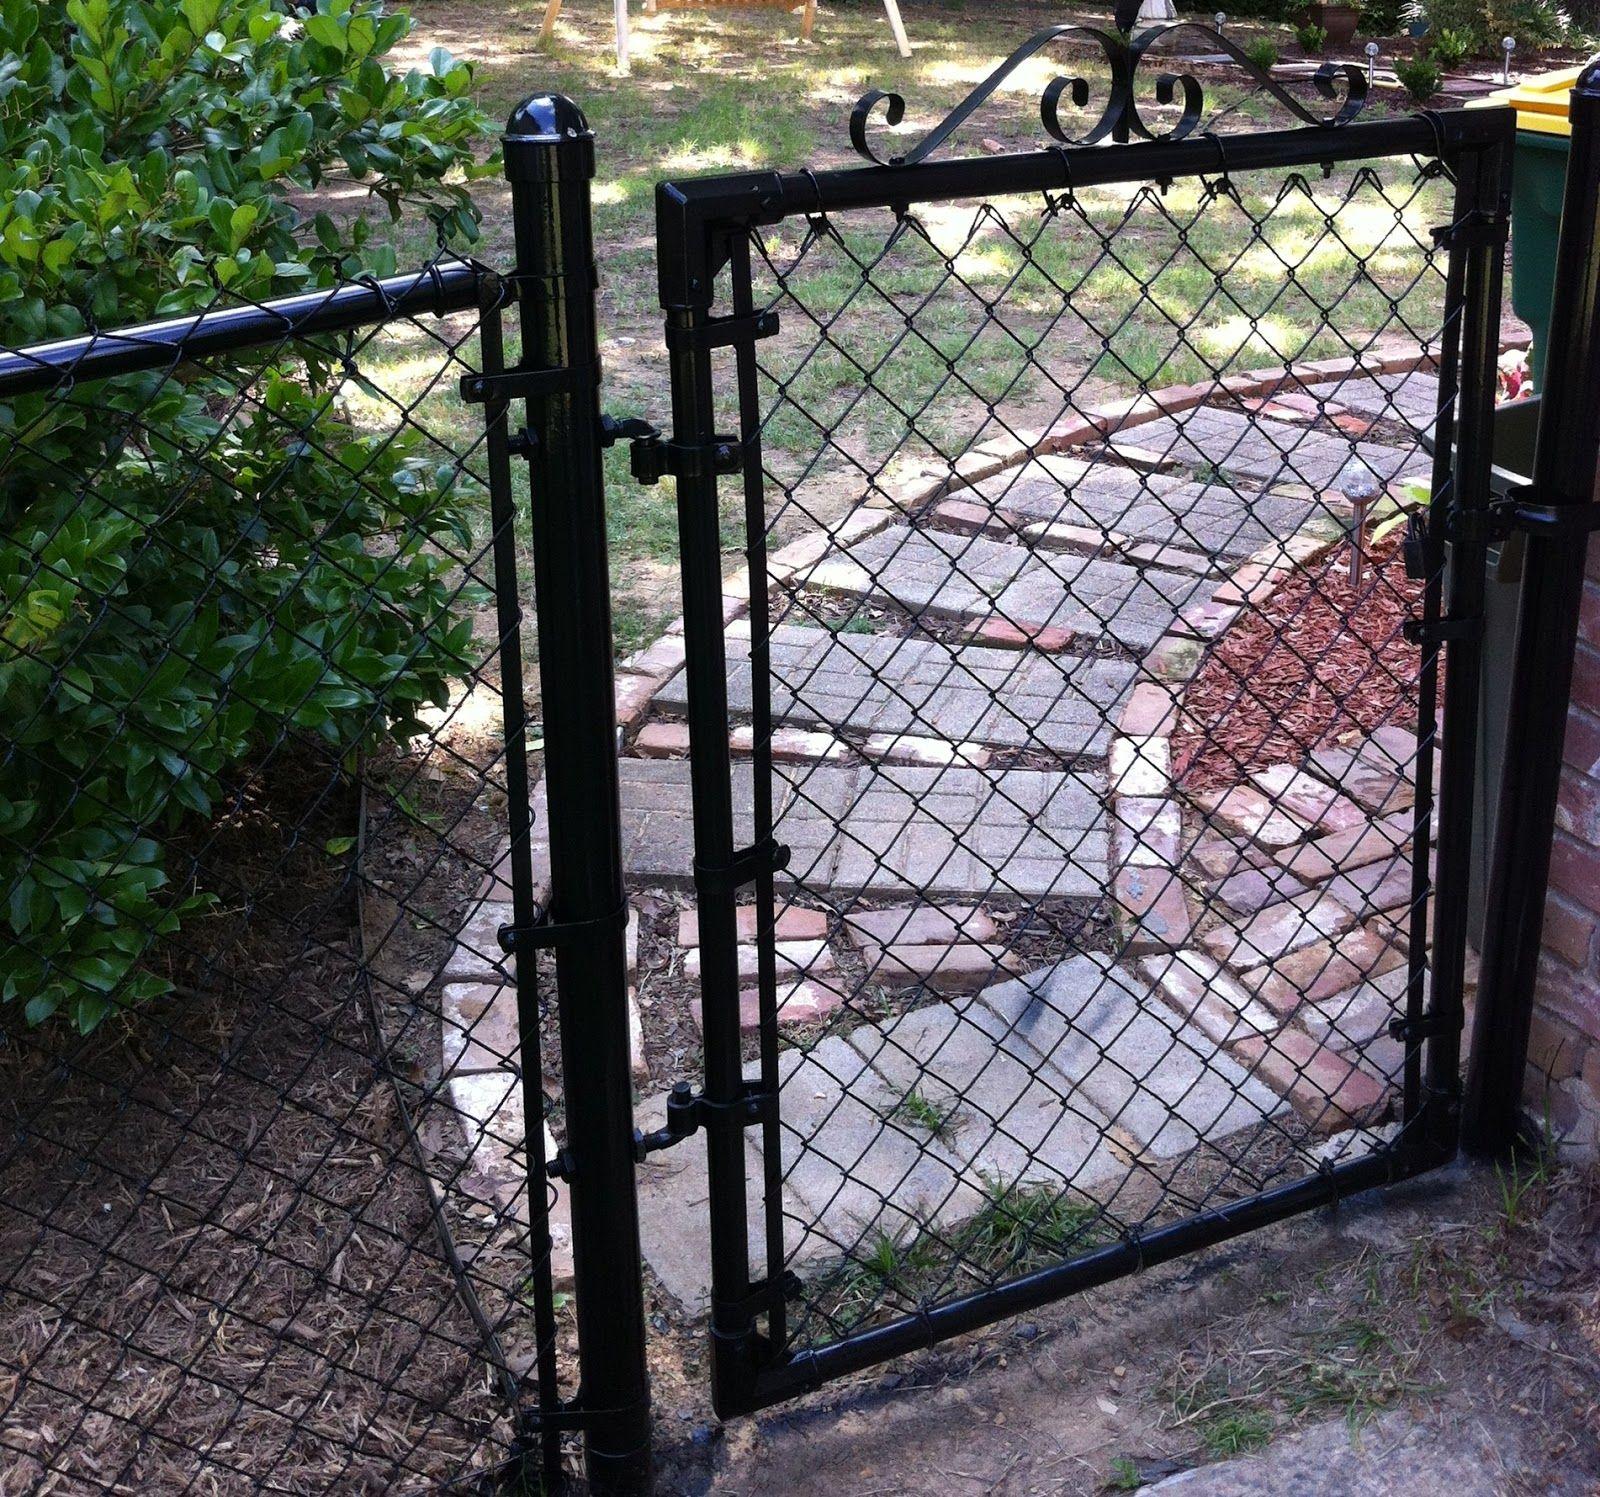 Gate Chain Link Painted Black Jpg 1 600 1 497 Pixels Painted Chain Link Fence Chain Link Fence Chain Link Fence Gate